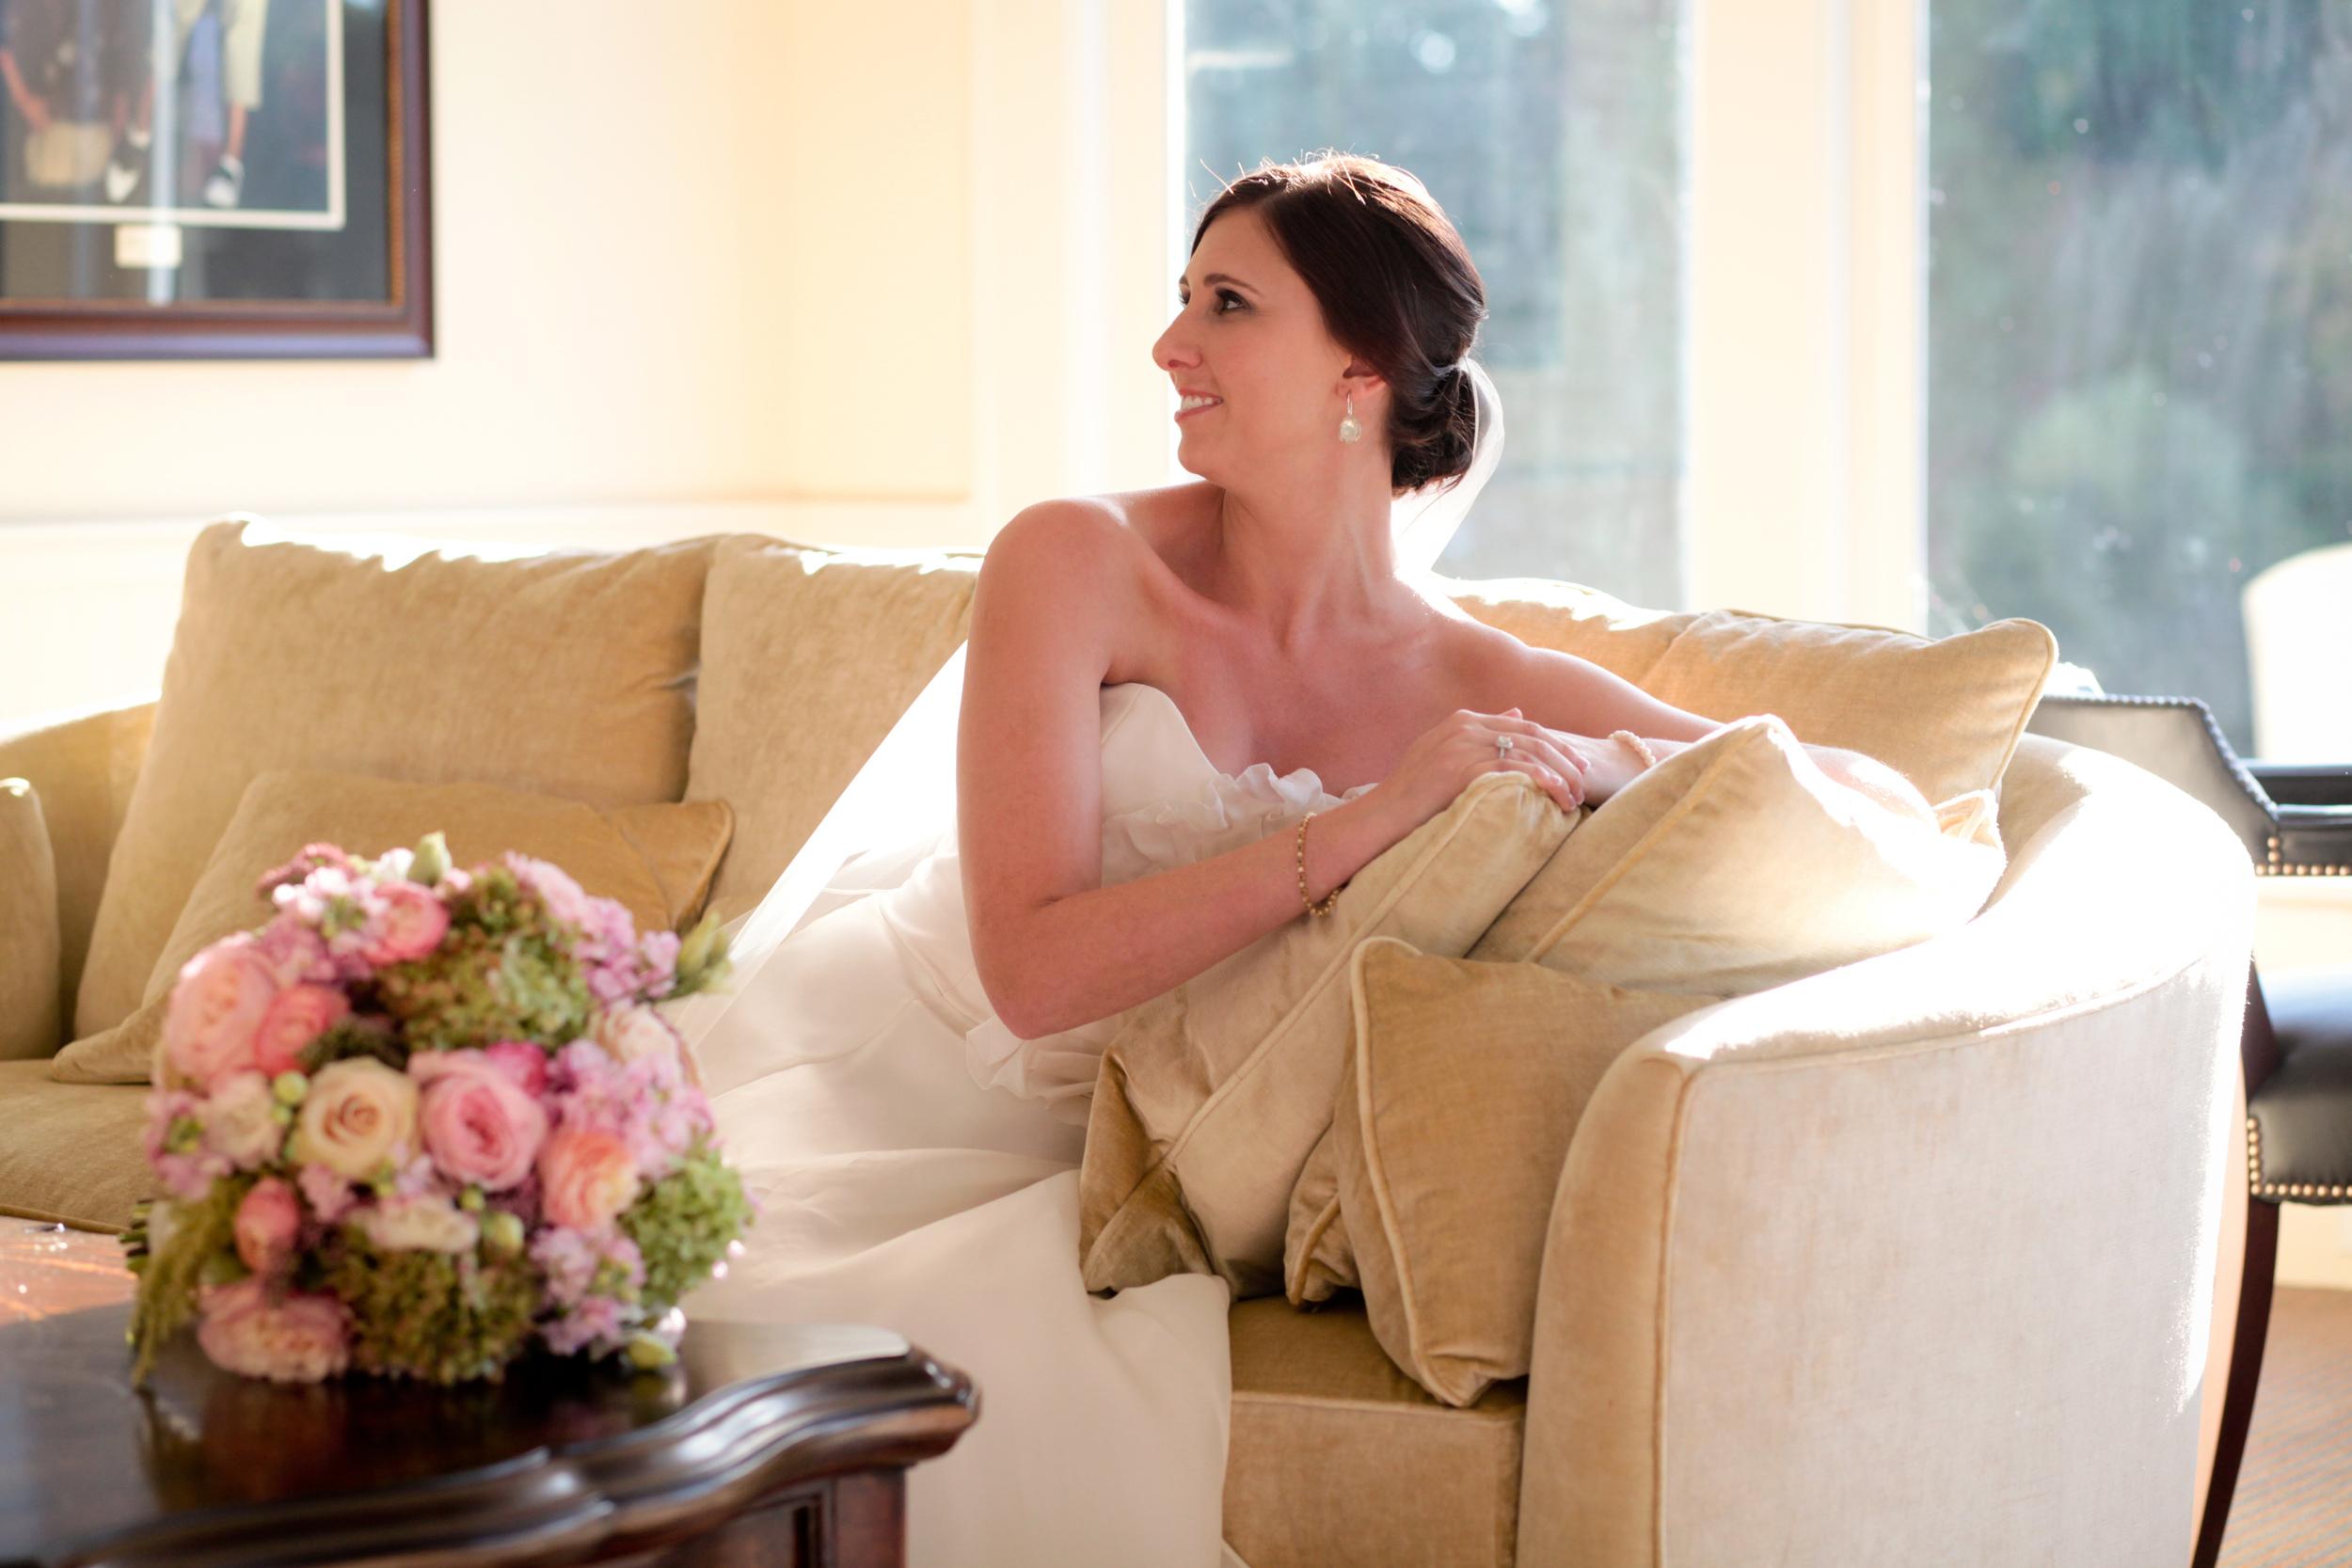 trump-national-golf-club-wedding-charlotte-nc-live-wedding-artist